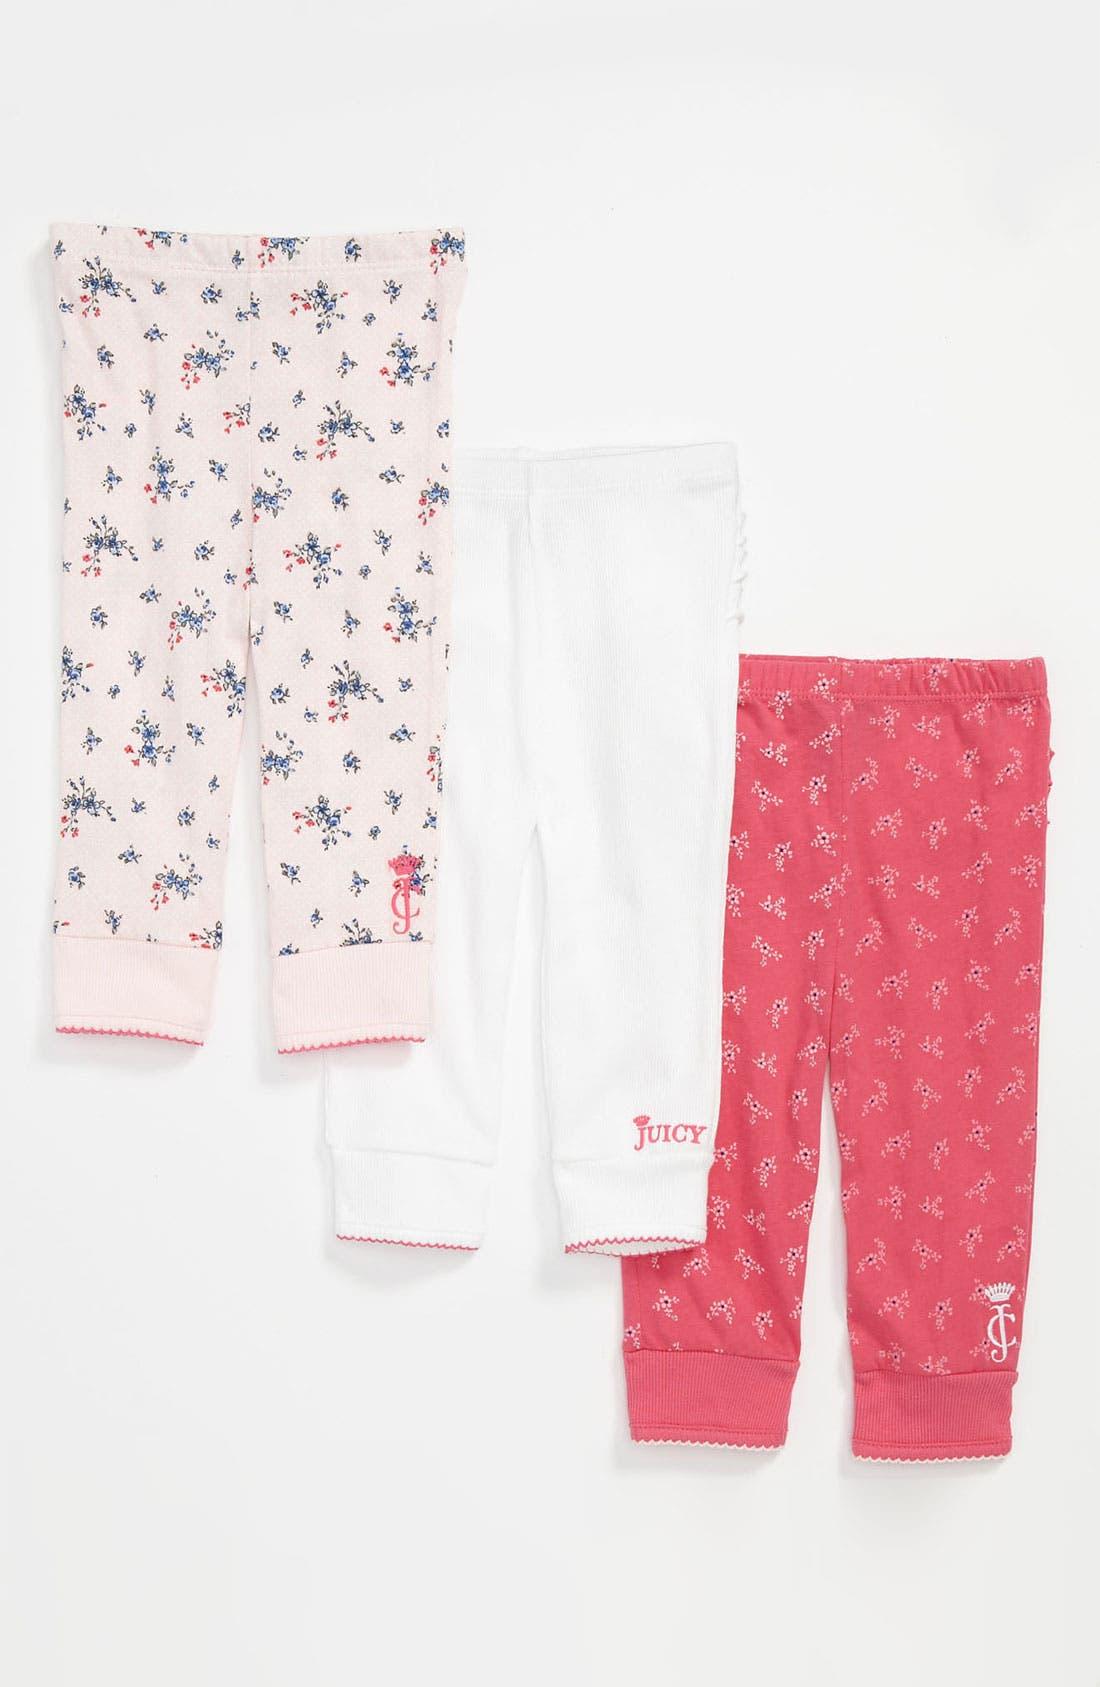 Alternate Image 1 Selected - Juicy Couture Leggings (3-Pack) (Baby)